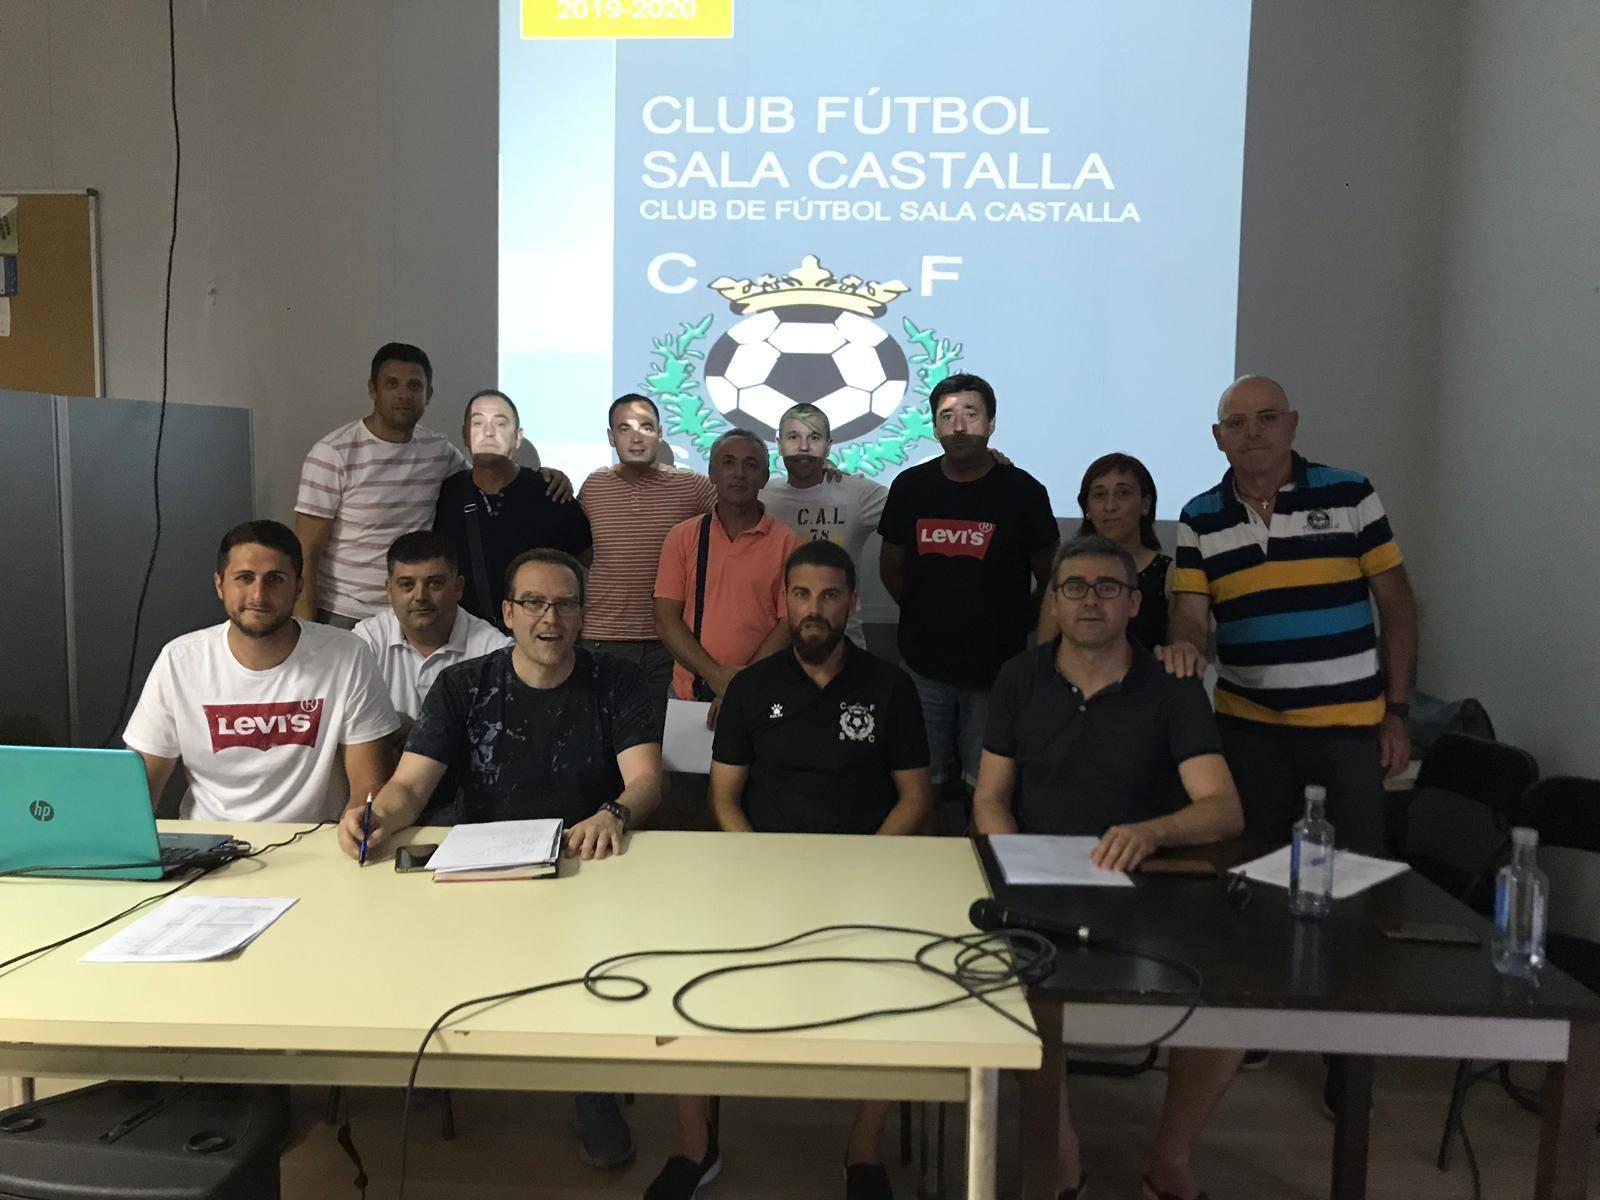 Carlos Ferrandis repite al frente de la nueva directiva del CFS Castalla